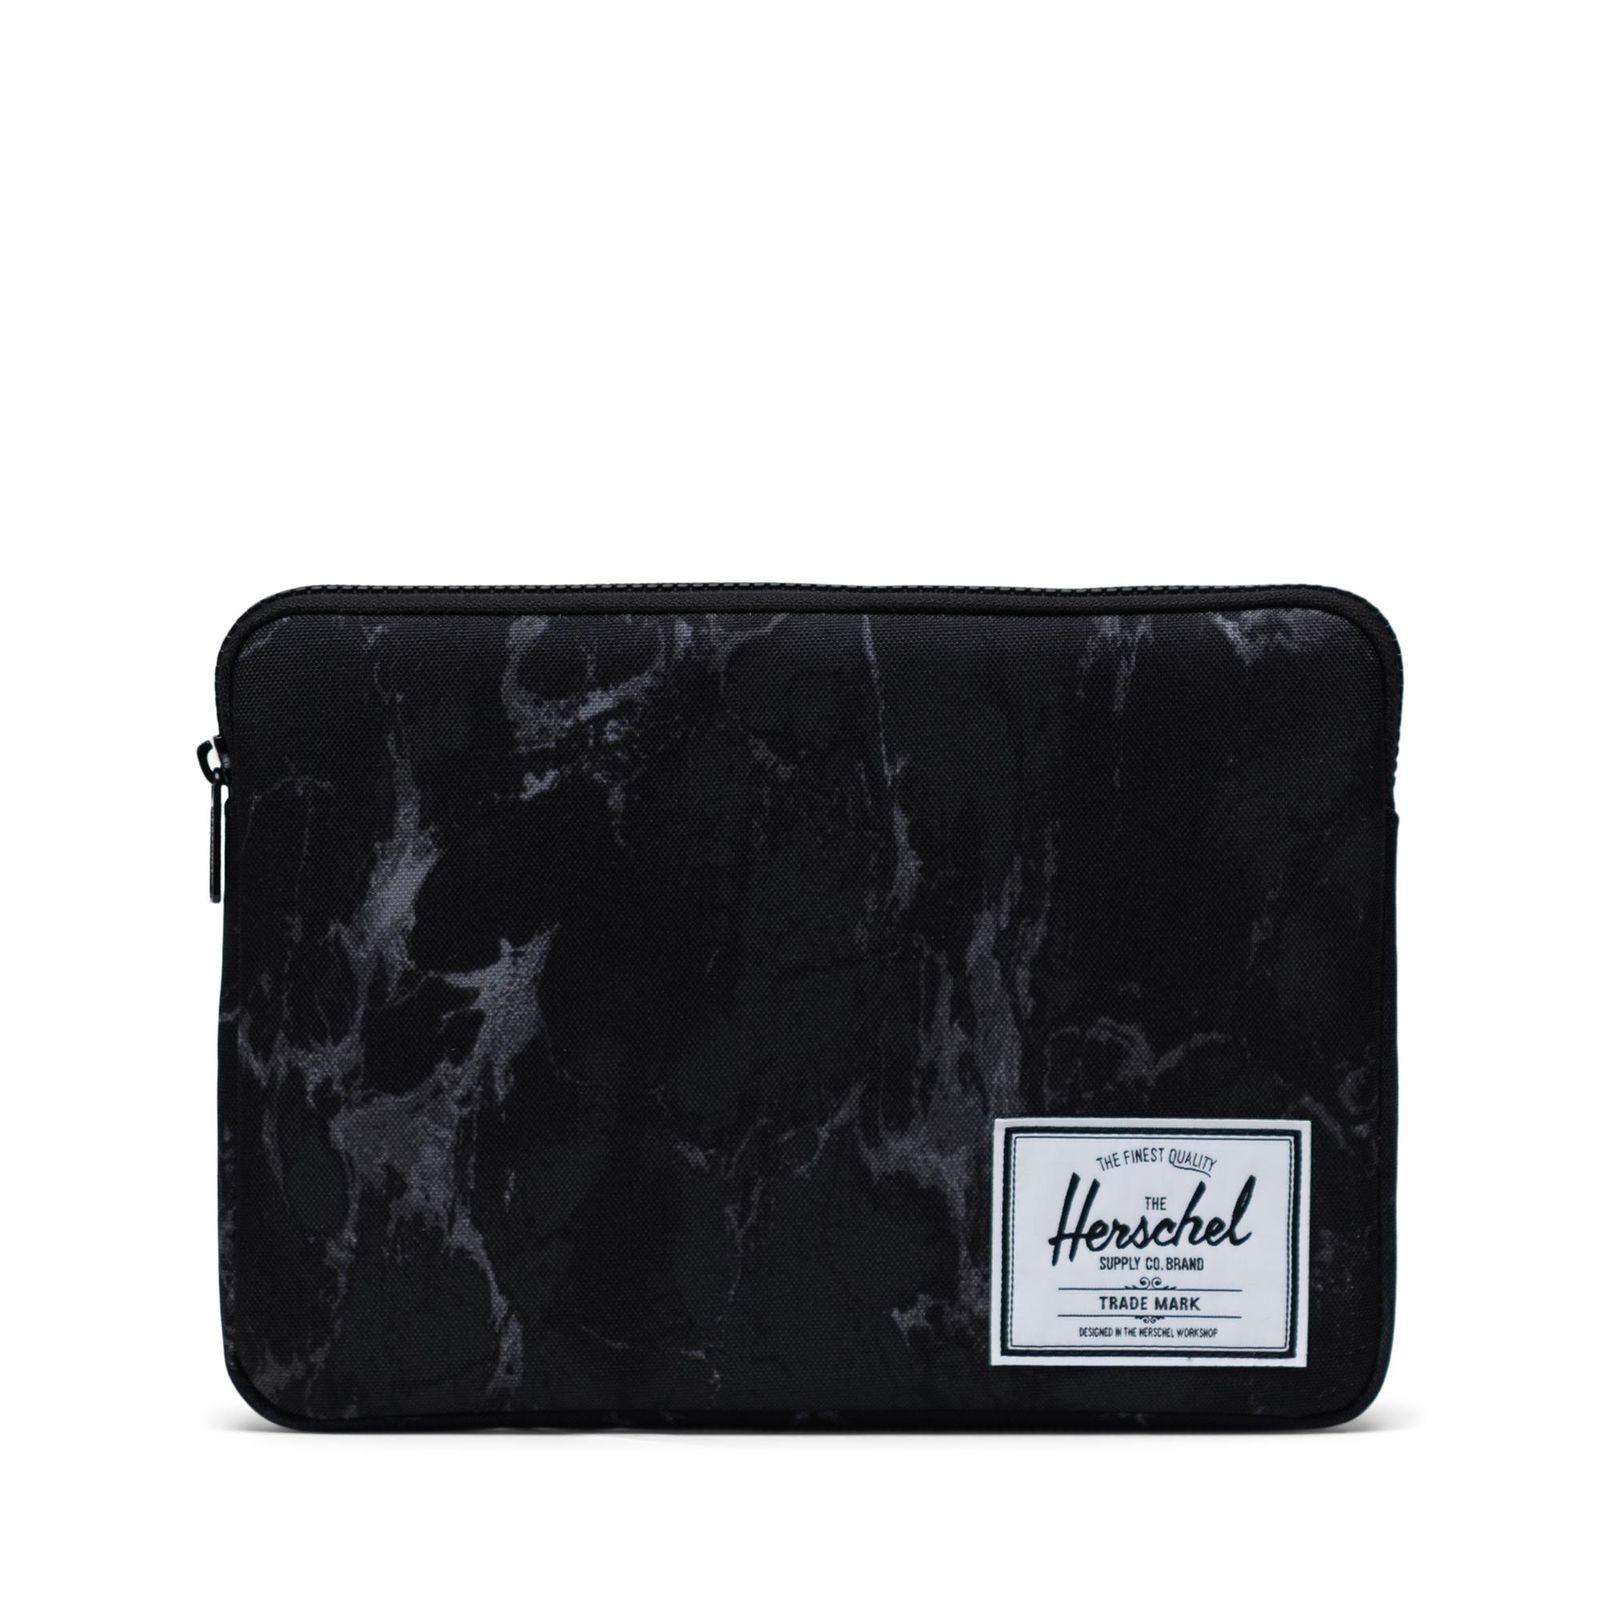 Herschel Laptop Kılıfı Anchor Sleeve for 12 inch MacBook Black Marble